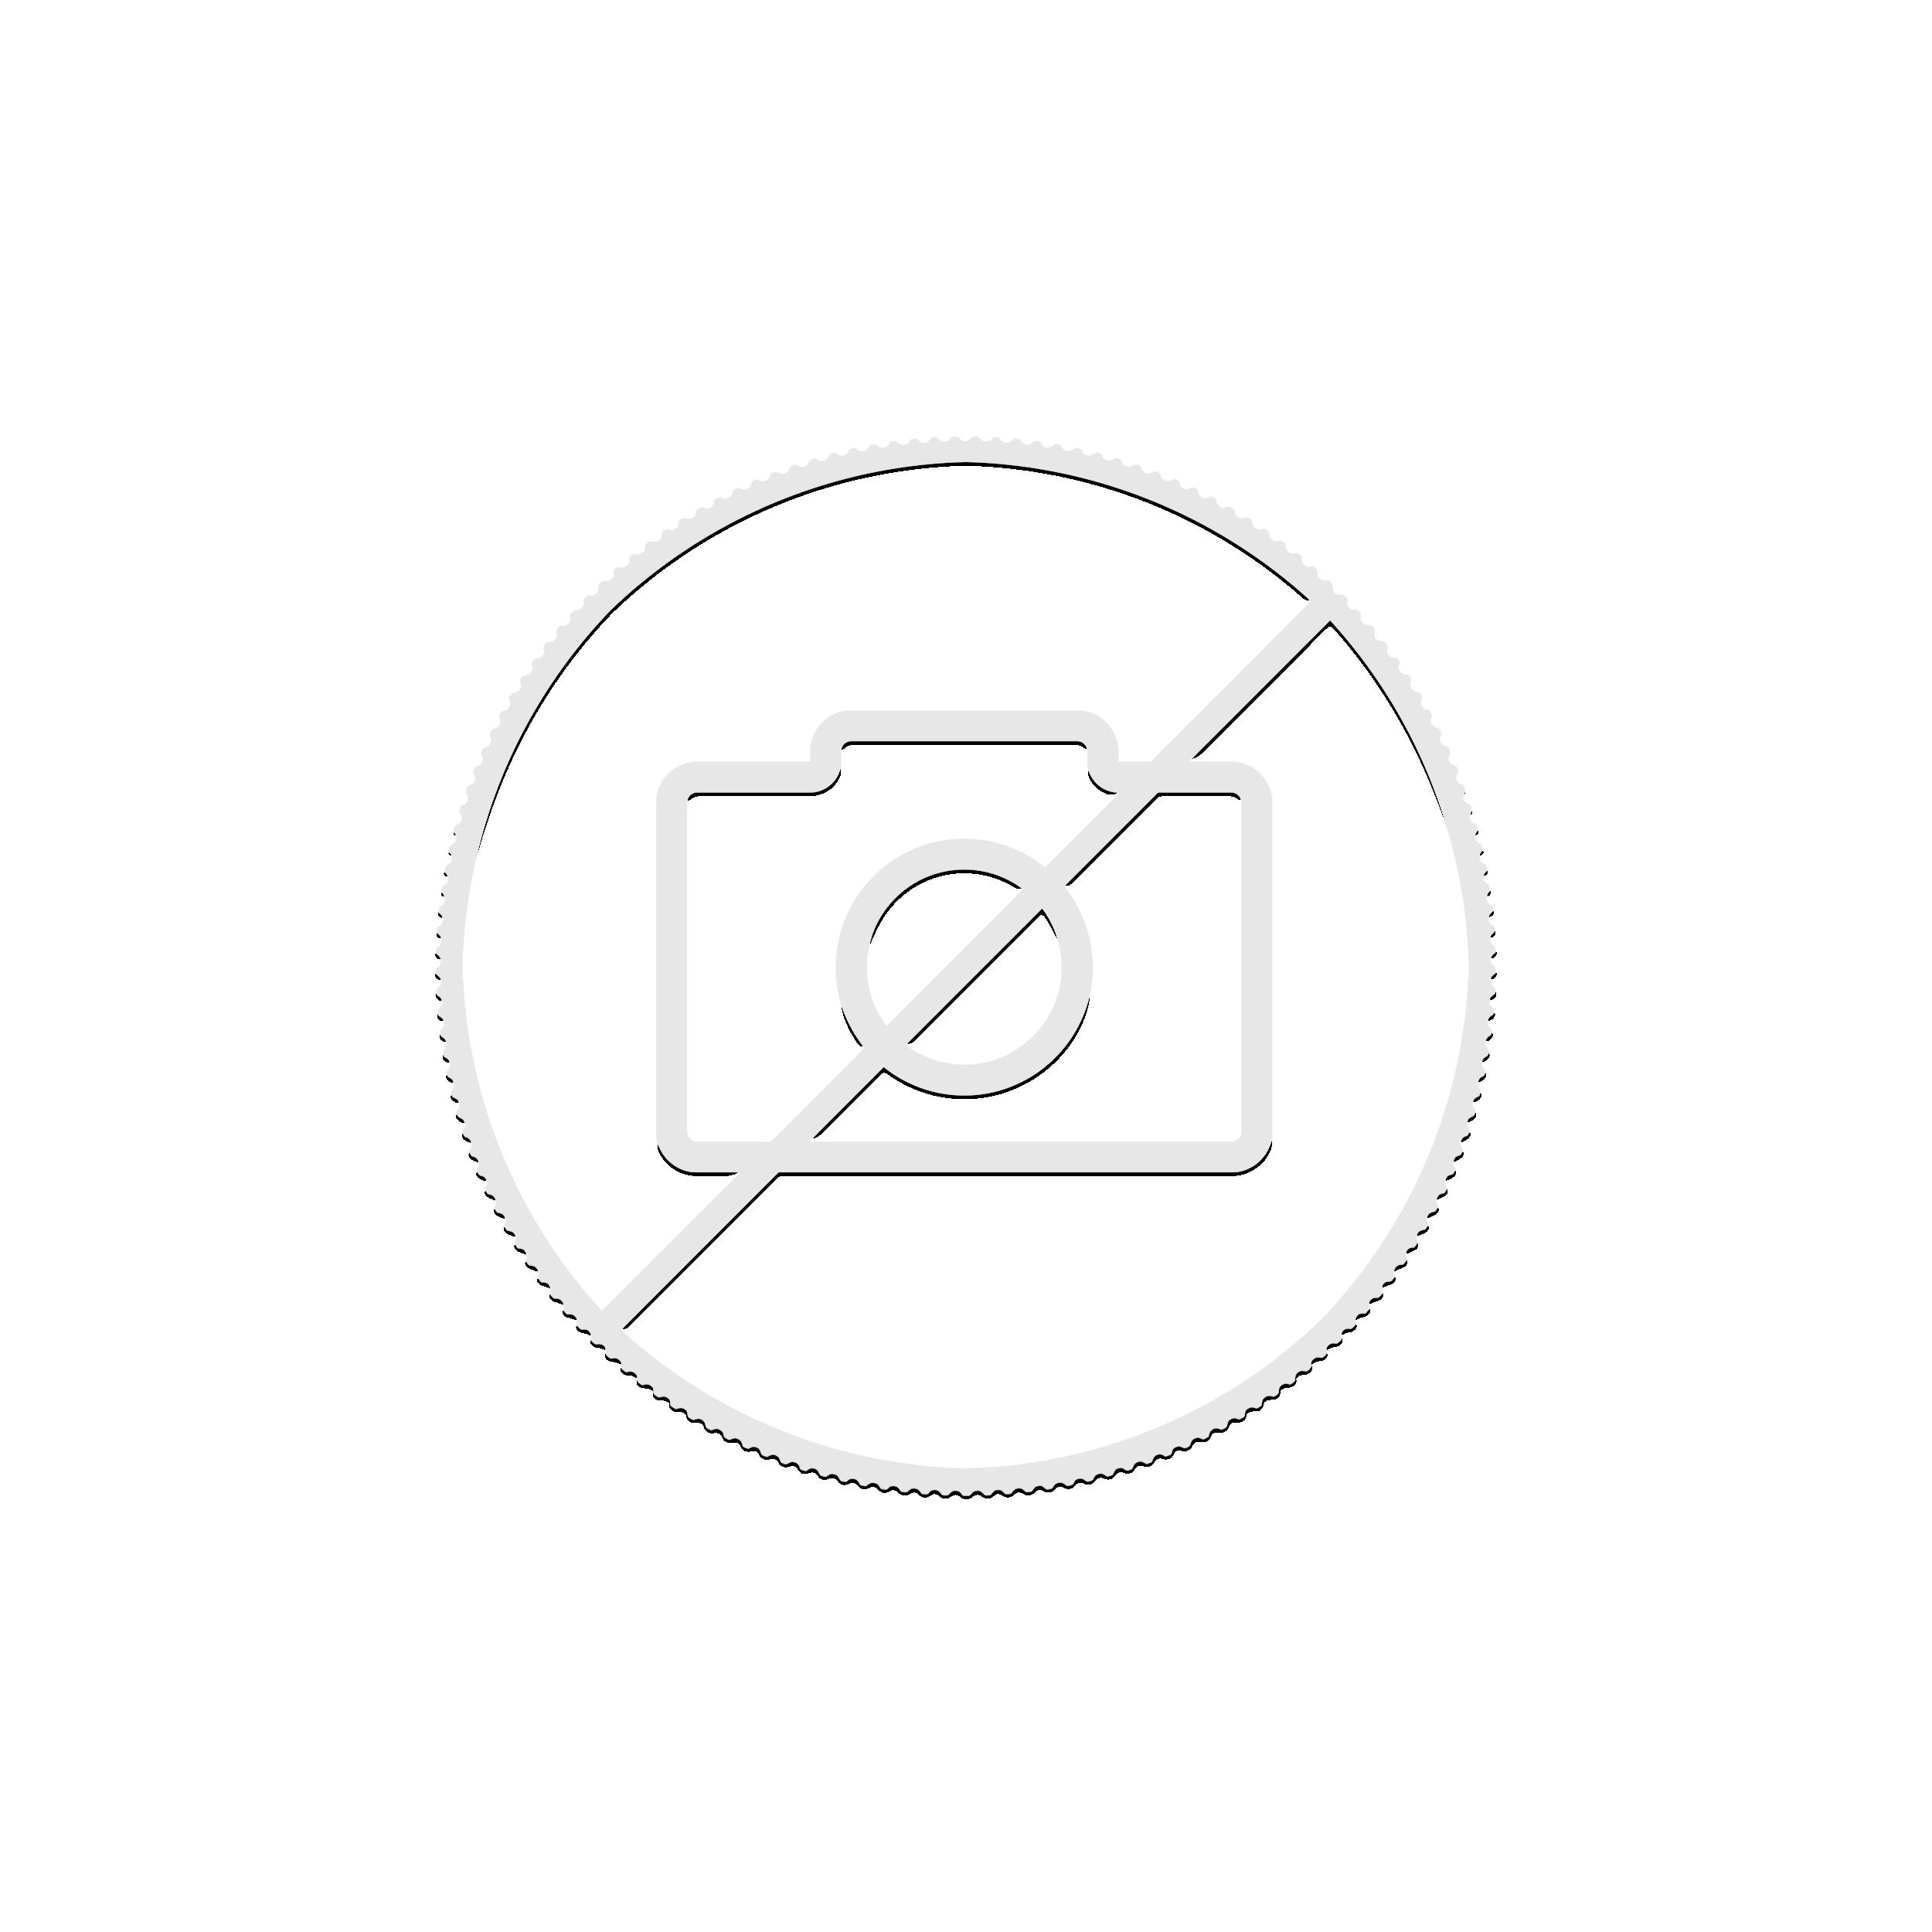 1 Troy ounce zilver Kookaburra munt 2014